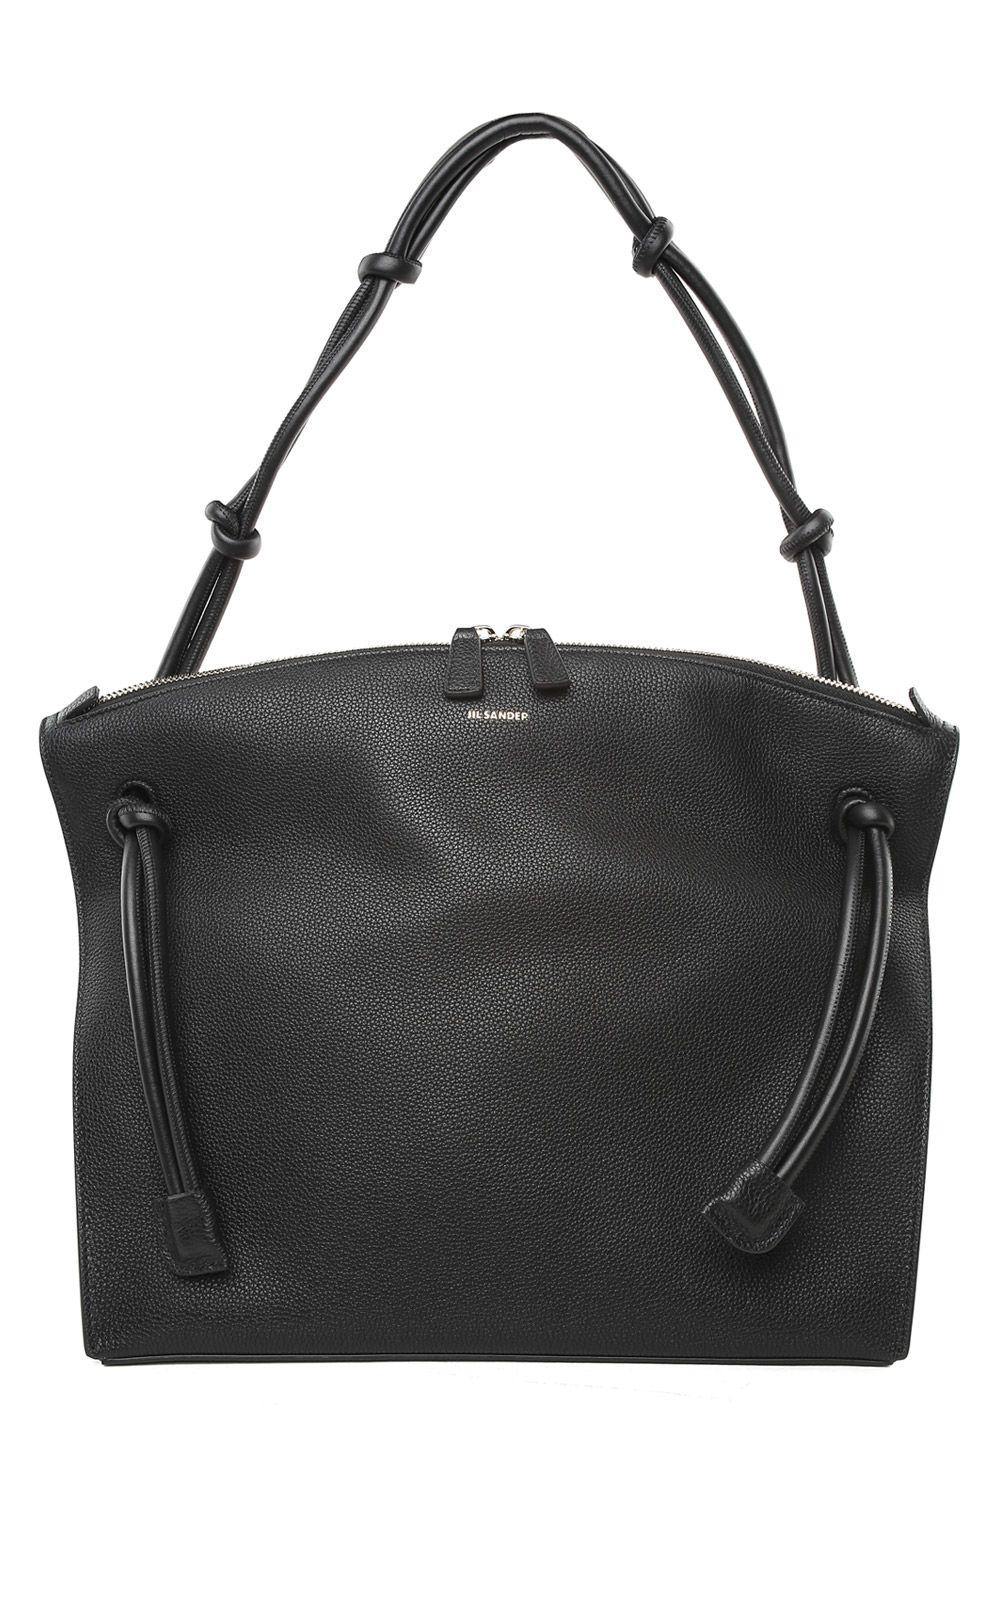 Jil Sander Hill Md Grained-leather Tote Bag